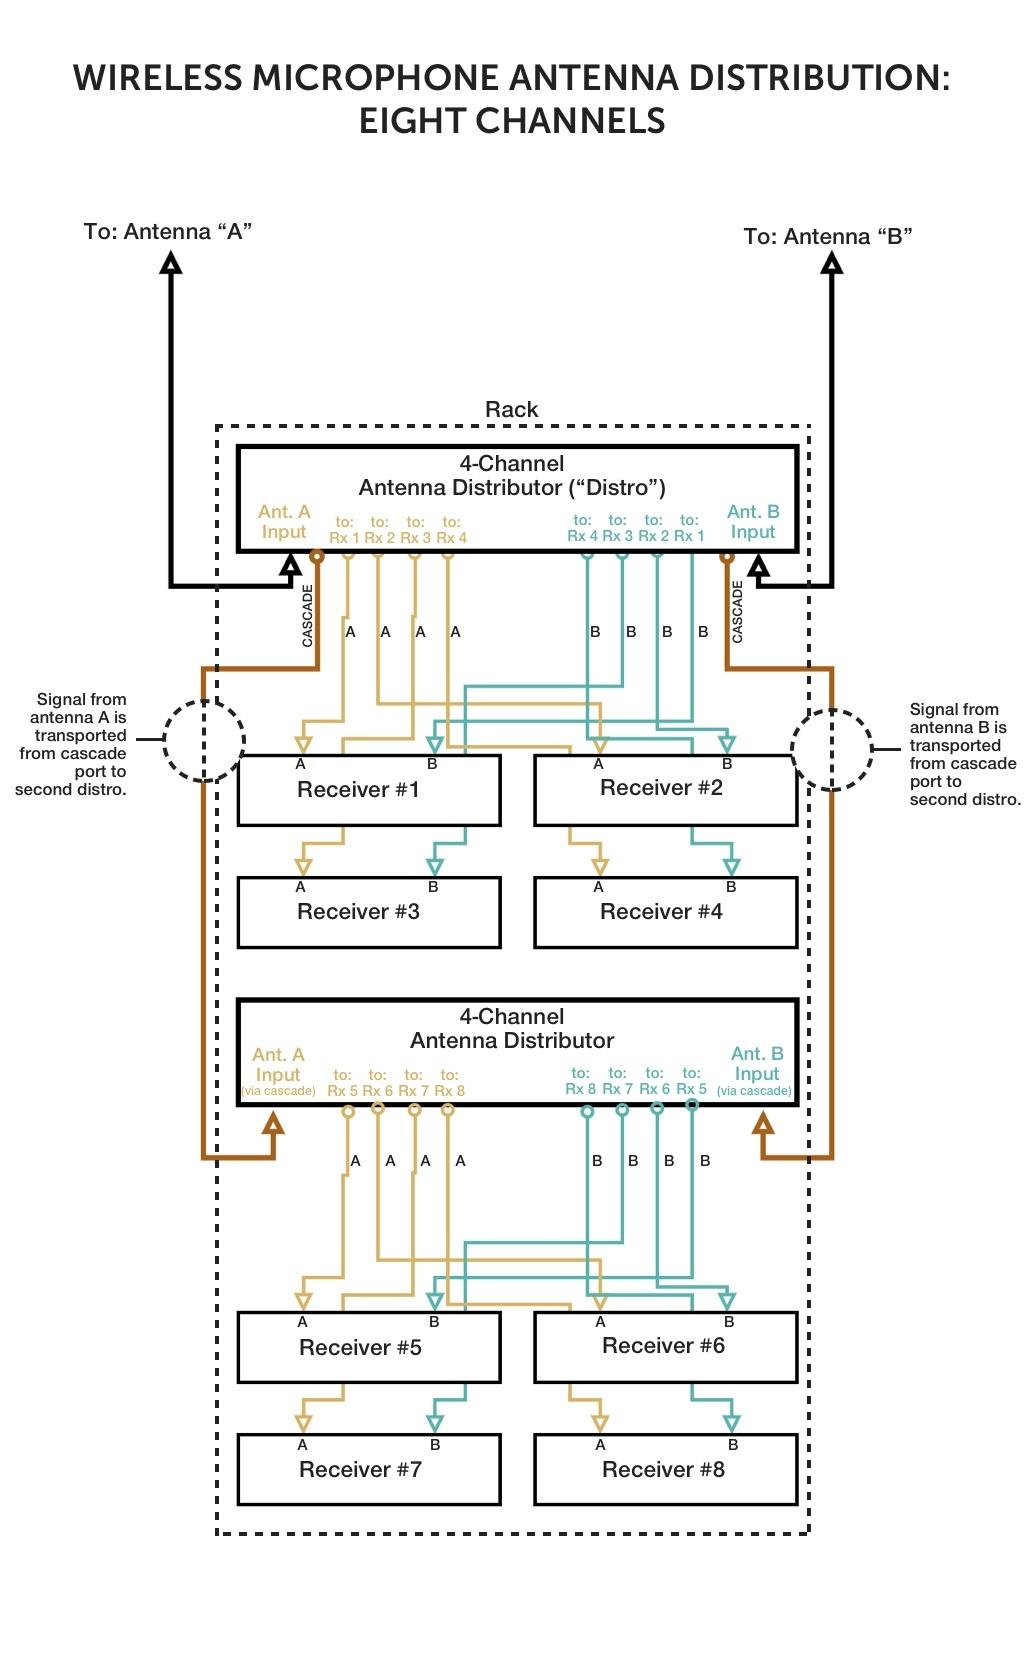 [SCHEMATICS_48EU]  Correct Antenna Distribution in Three Simple Diagrams   Wireless Antenna Diagram      RF Venue